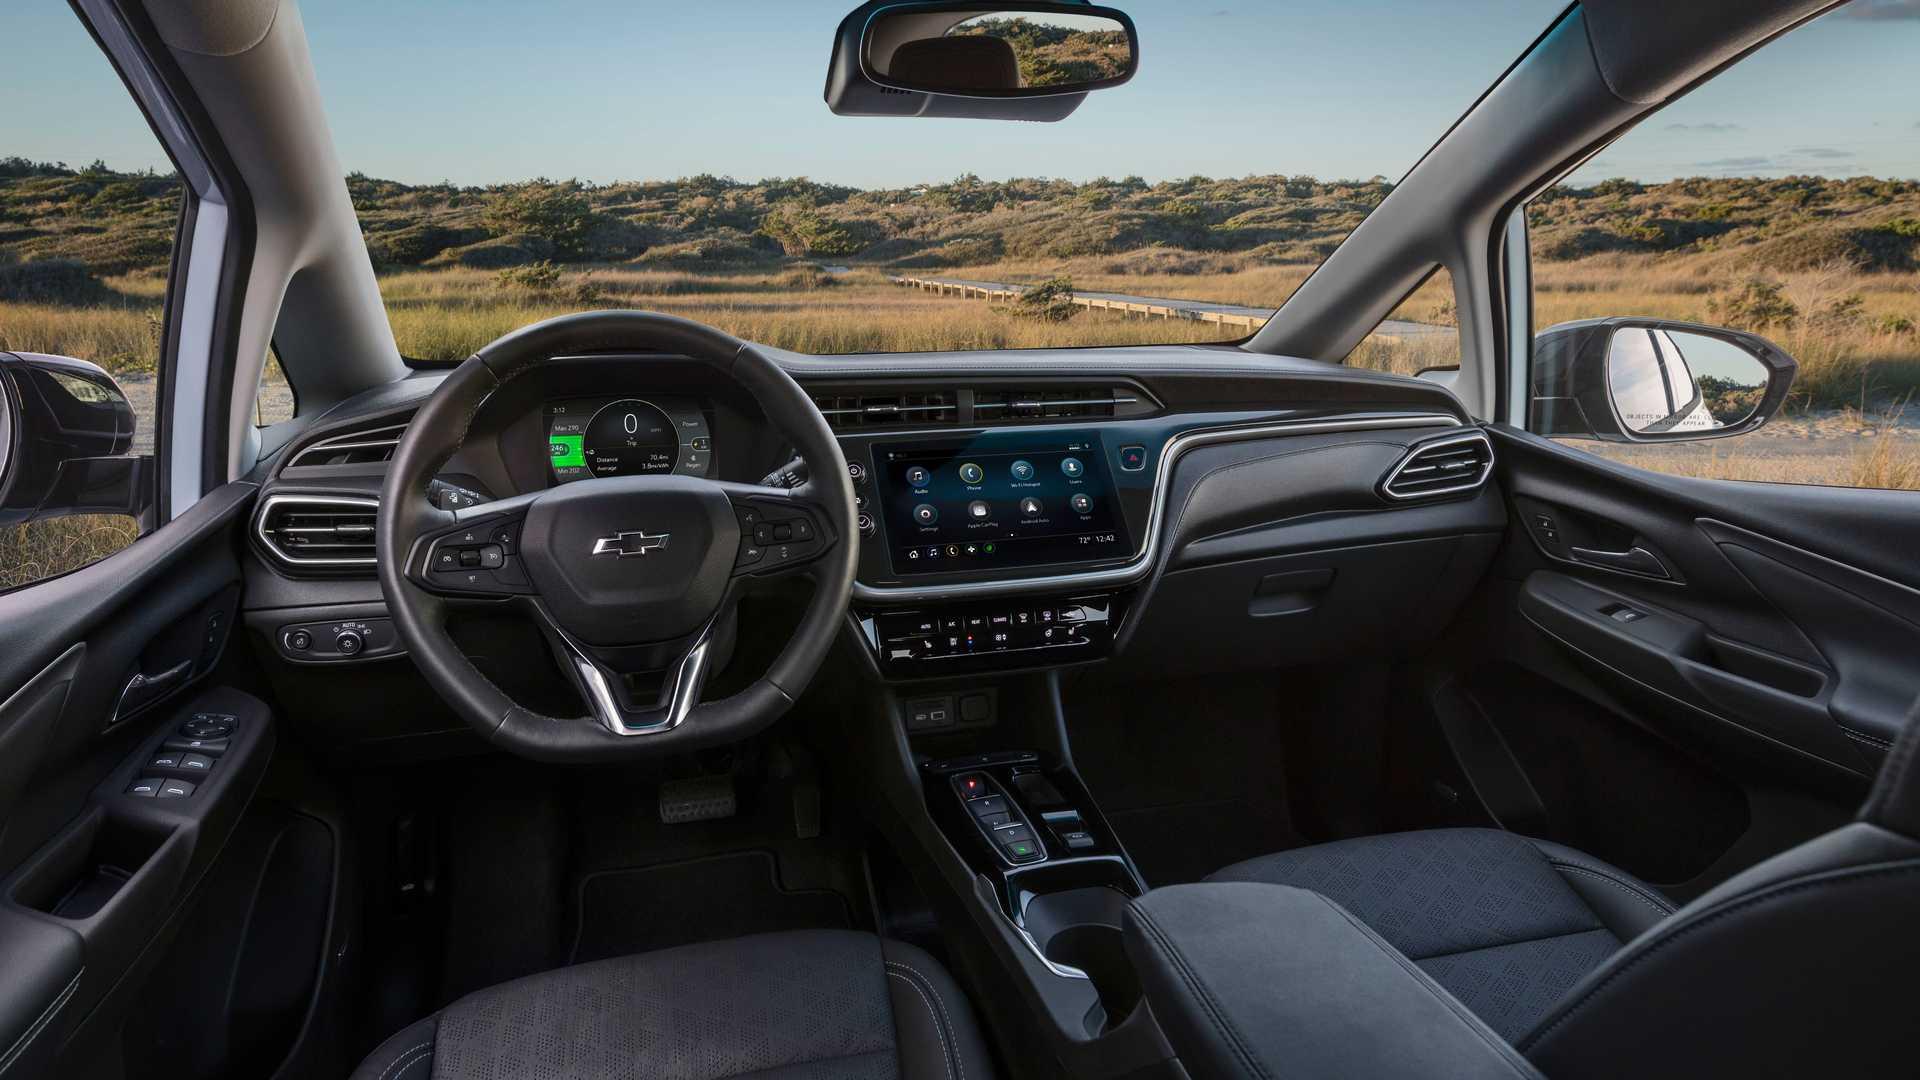 Inerior Nuevo Chevrolet Bolt EV 2022